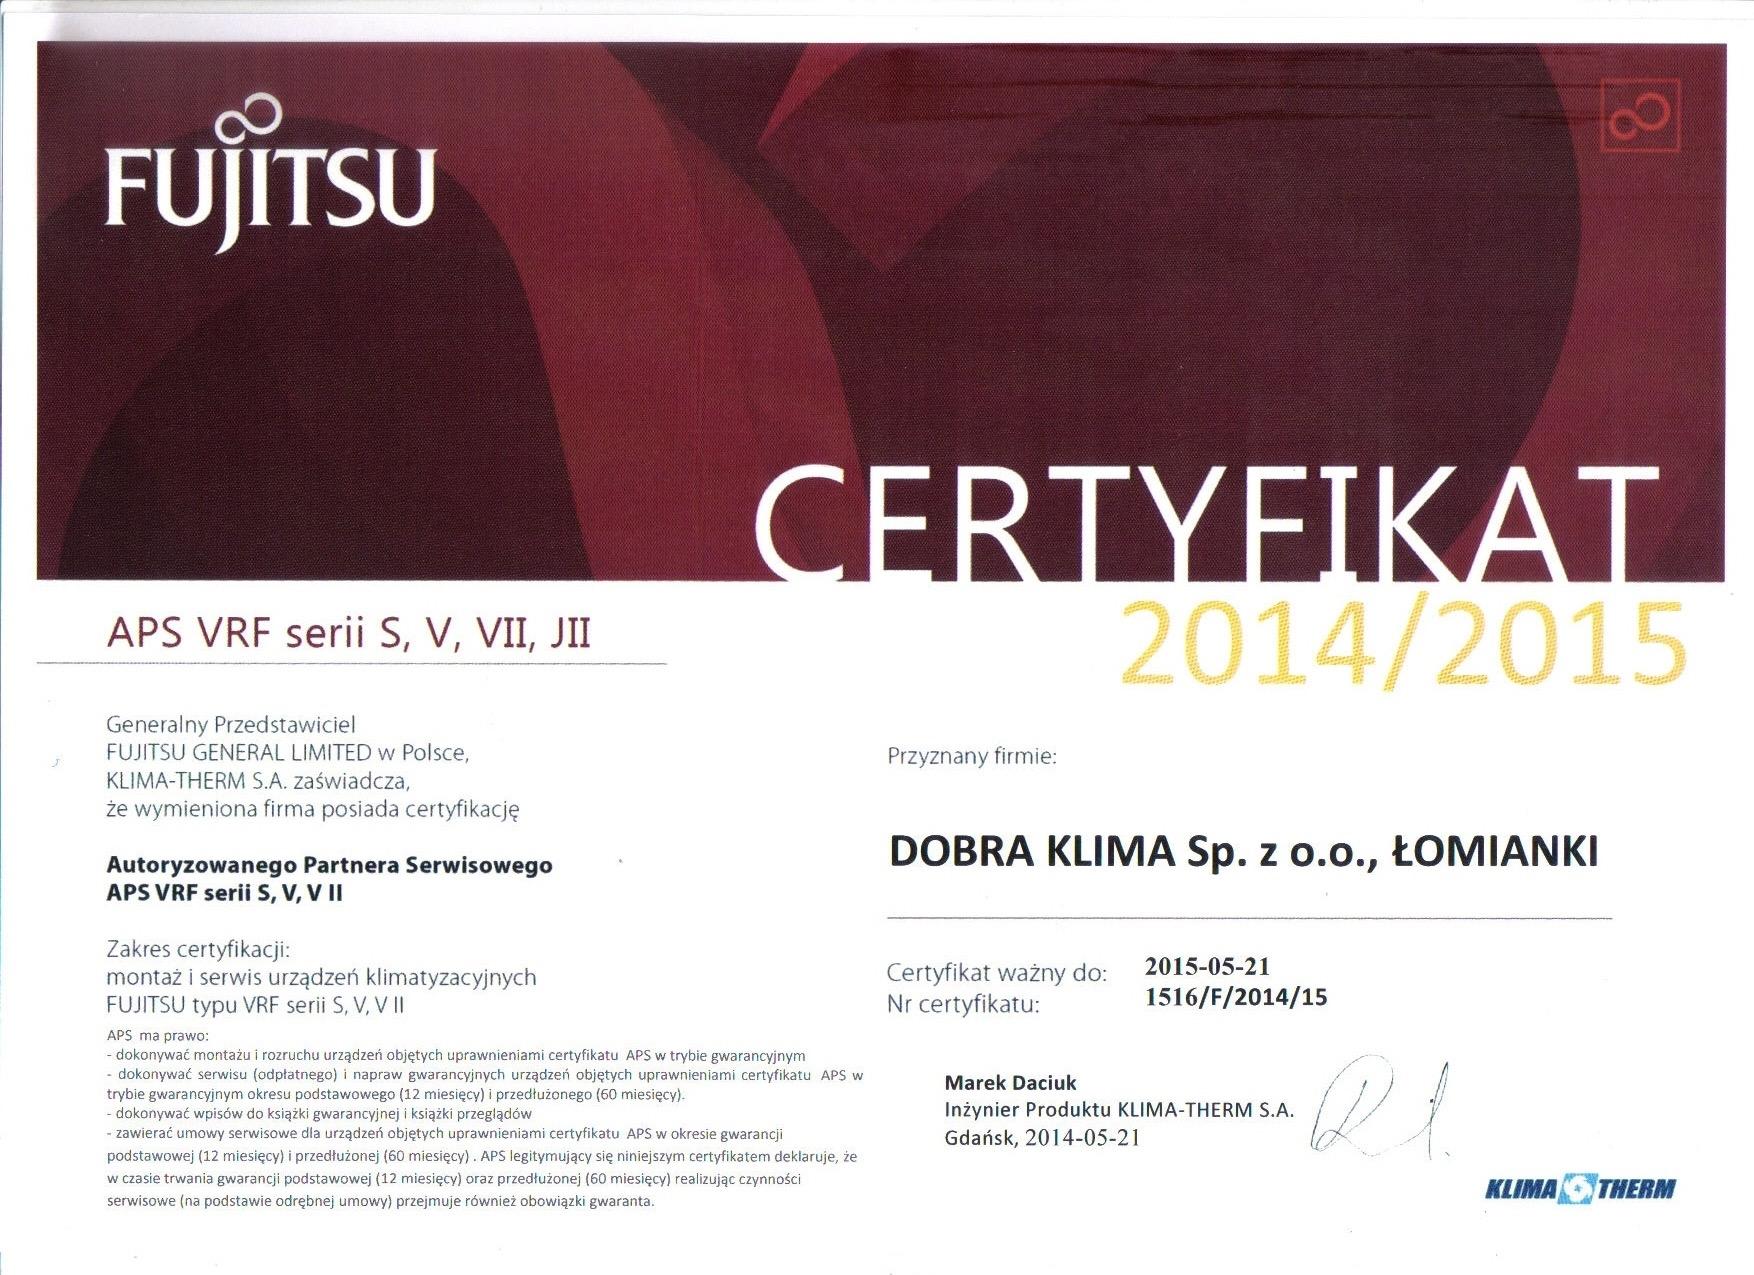 2014-certyfikat-fujitsu2